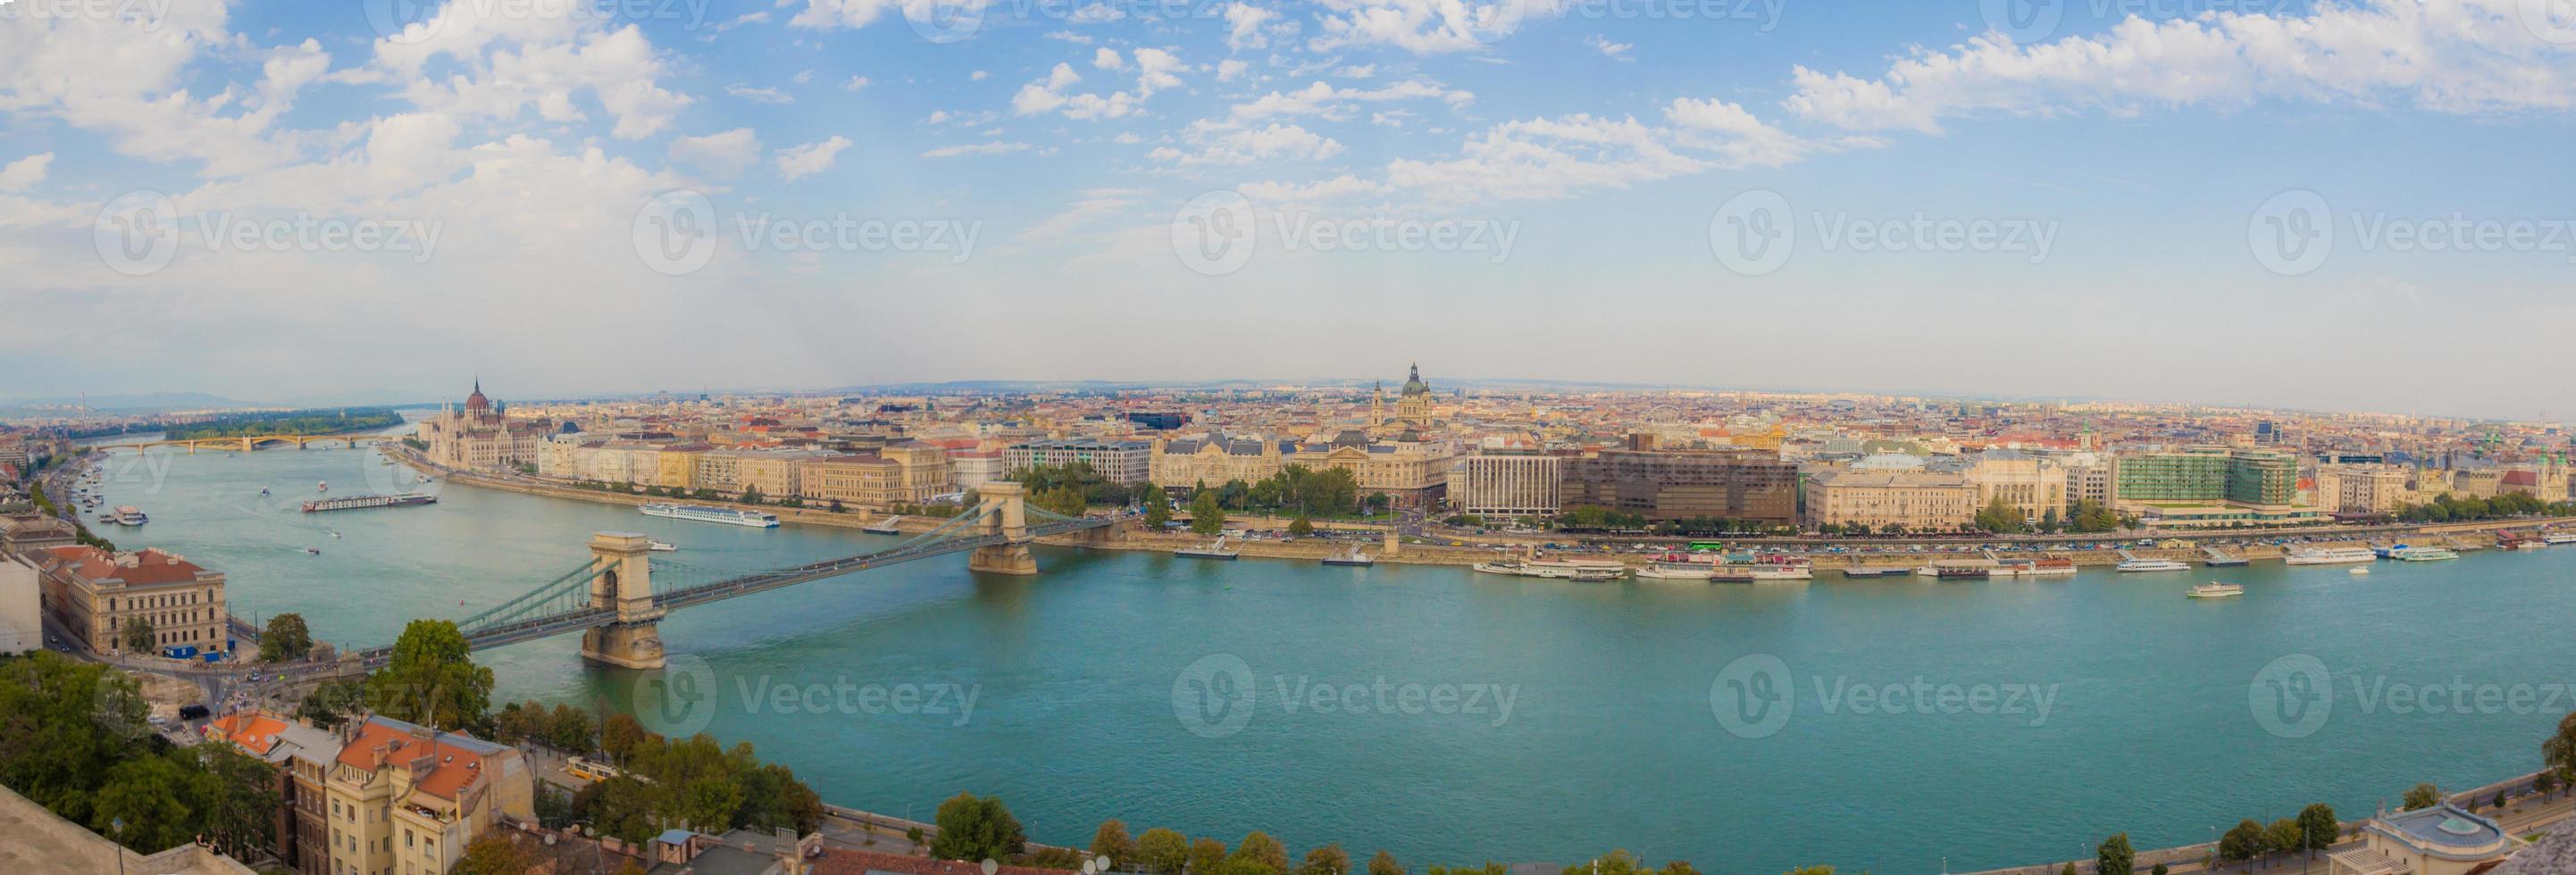 panorama van de stad boedapest, hongarije foto